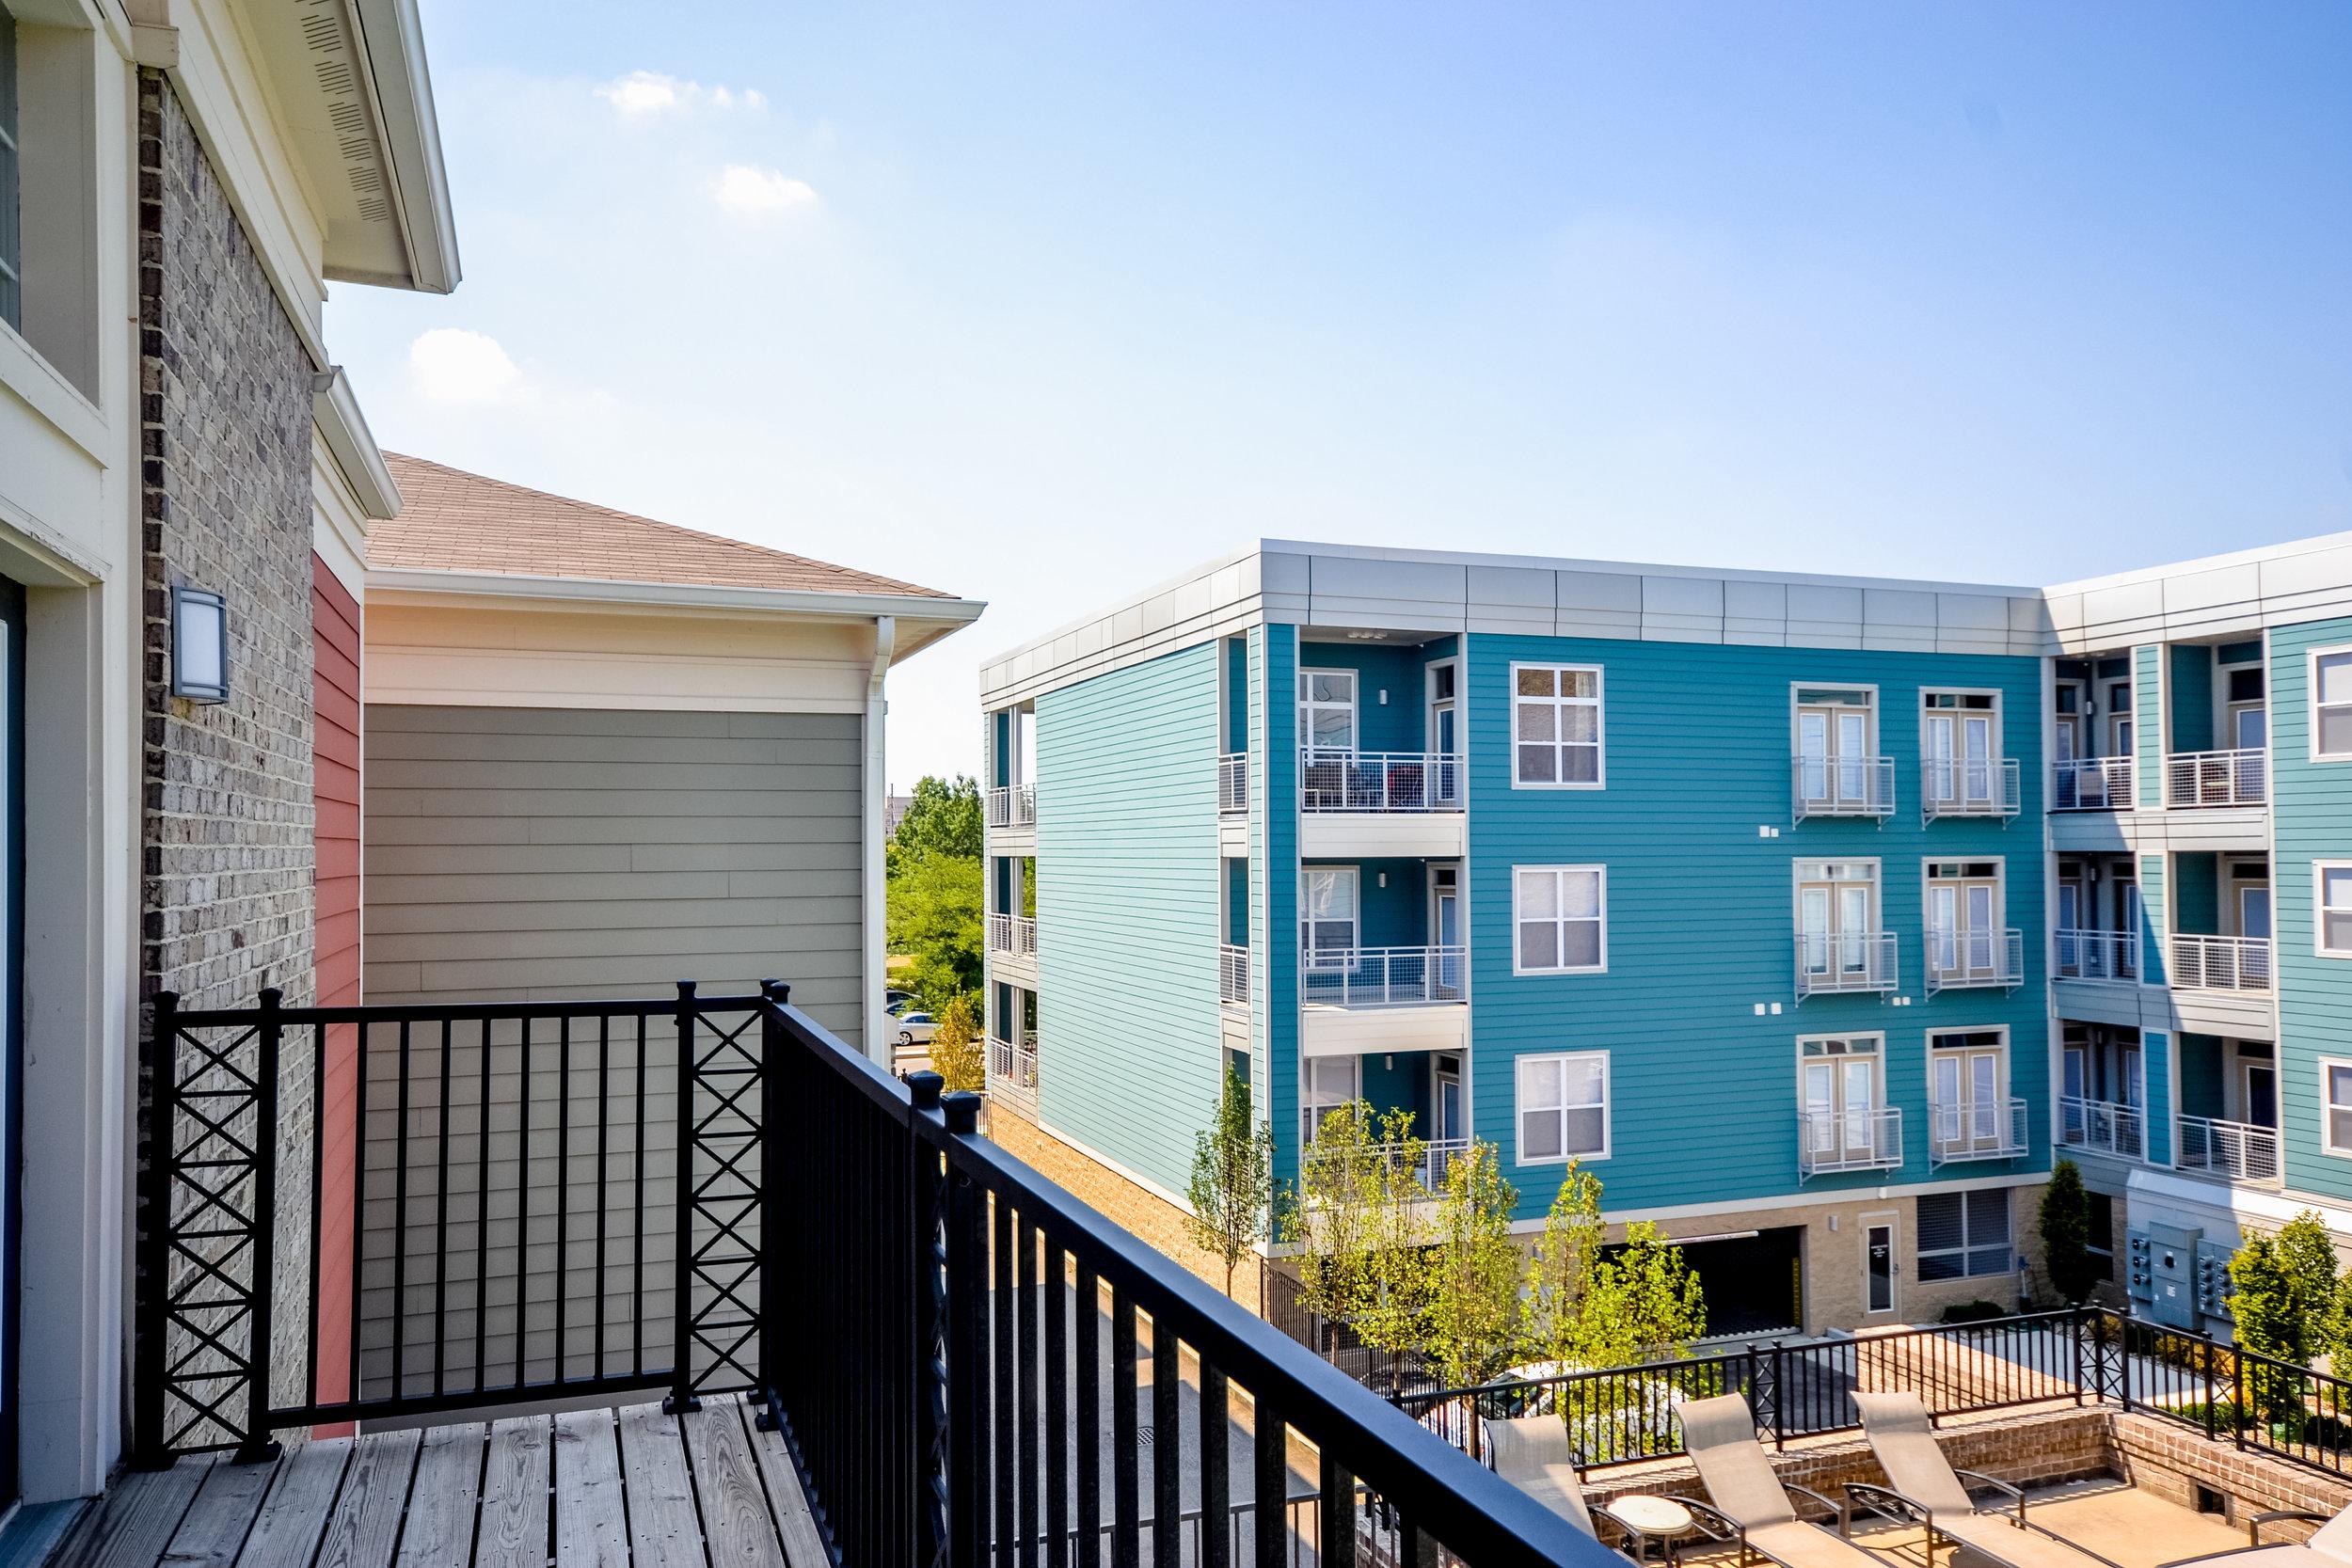 Waverley - model patio or balcony (apartment).jpg